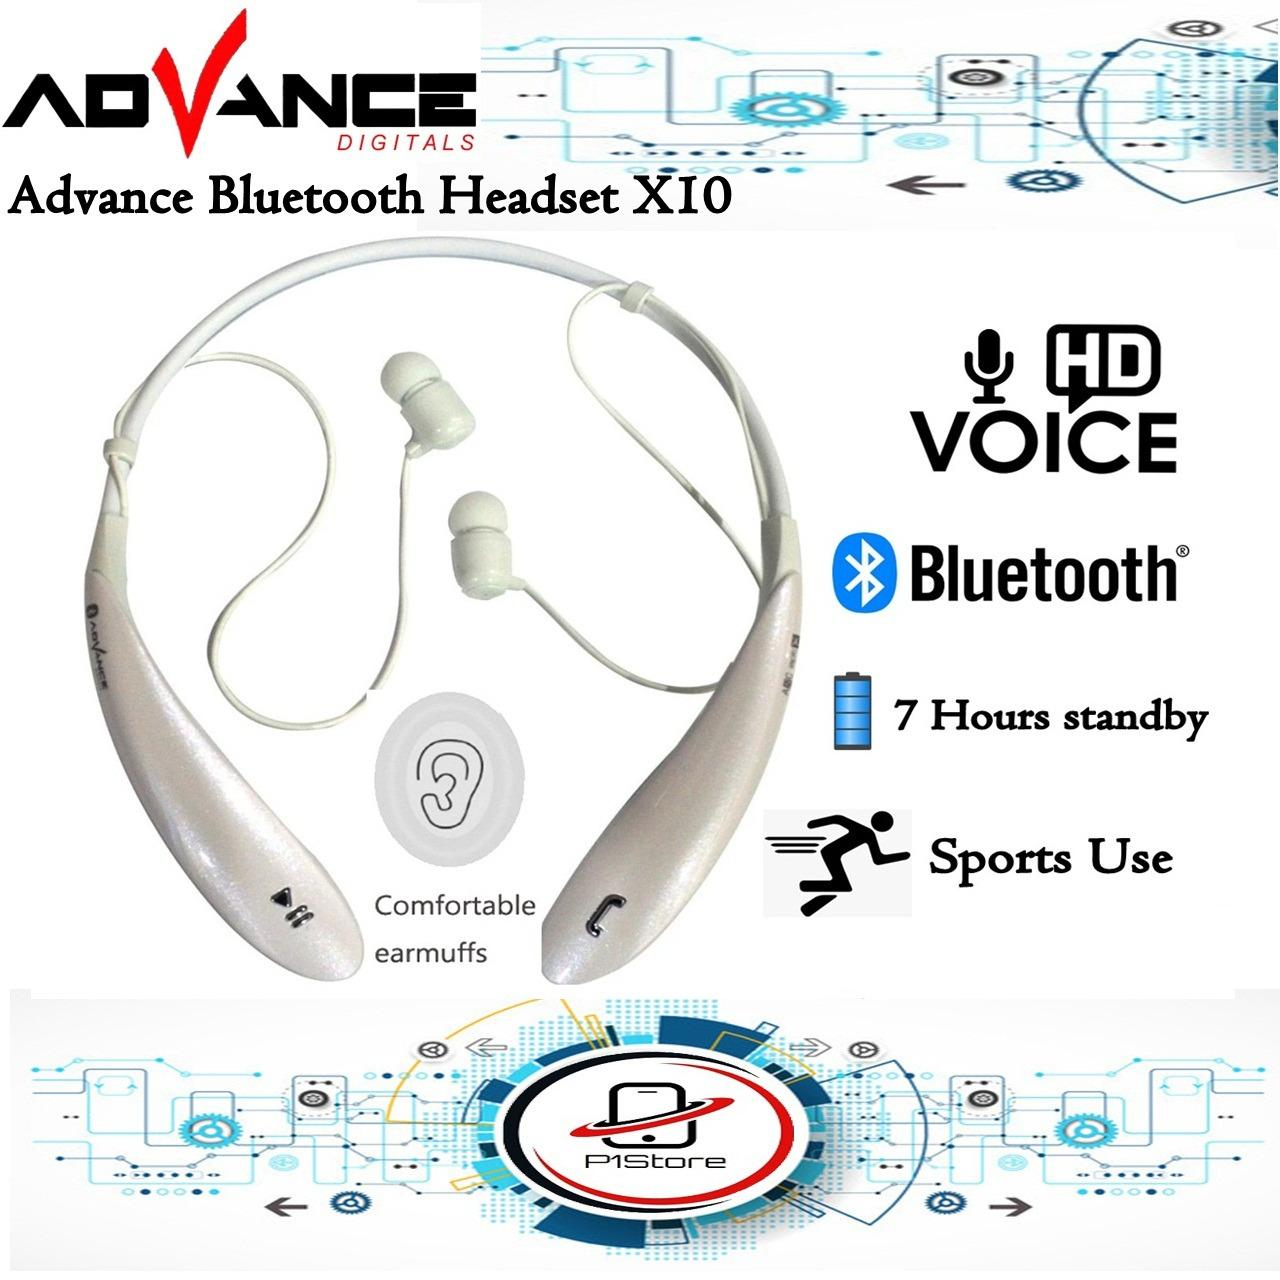 Jual Headset Advance Mh031 Harga Rp 100000 Mu8 Plus Mic X10 Bluetooth Earphone Handsfree Headphone